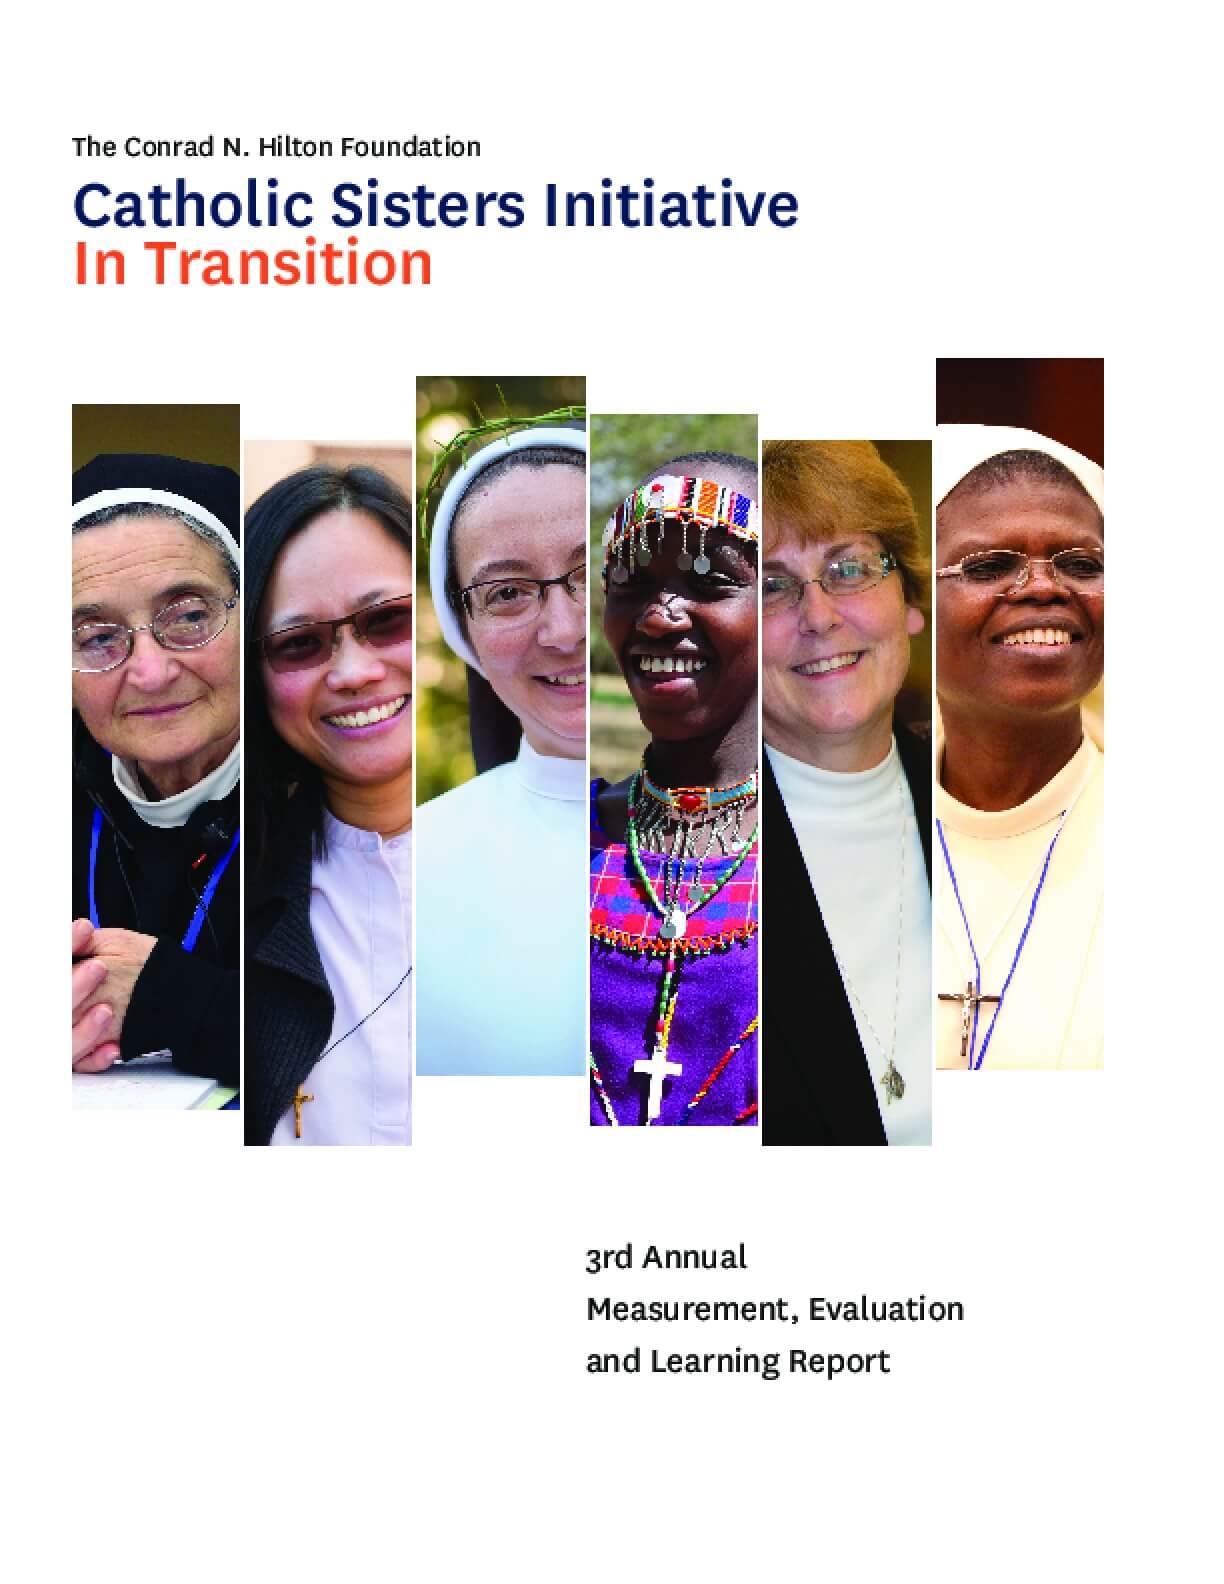 The Conrad N. Hilton Foundation Catholic Sisters Initiative: In Transition